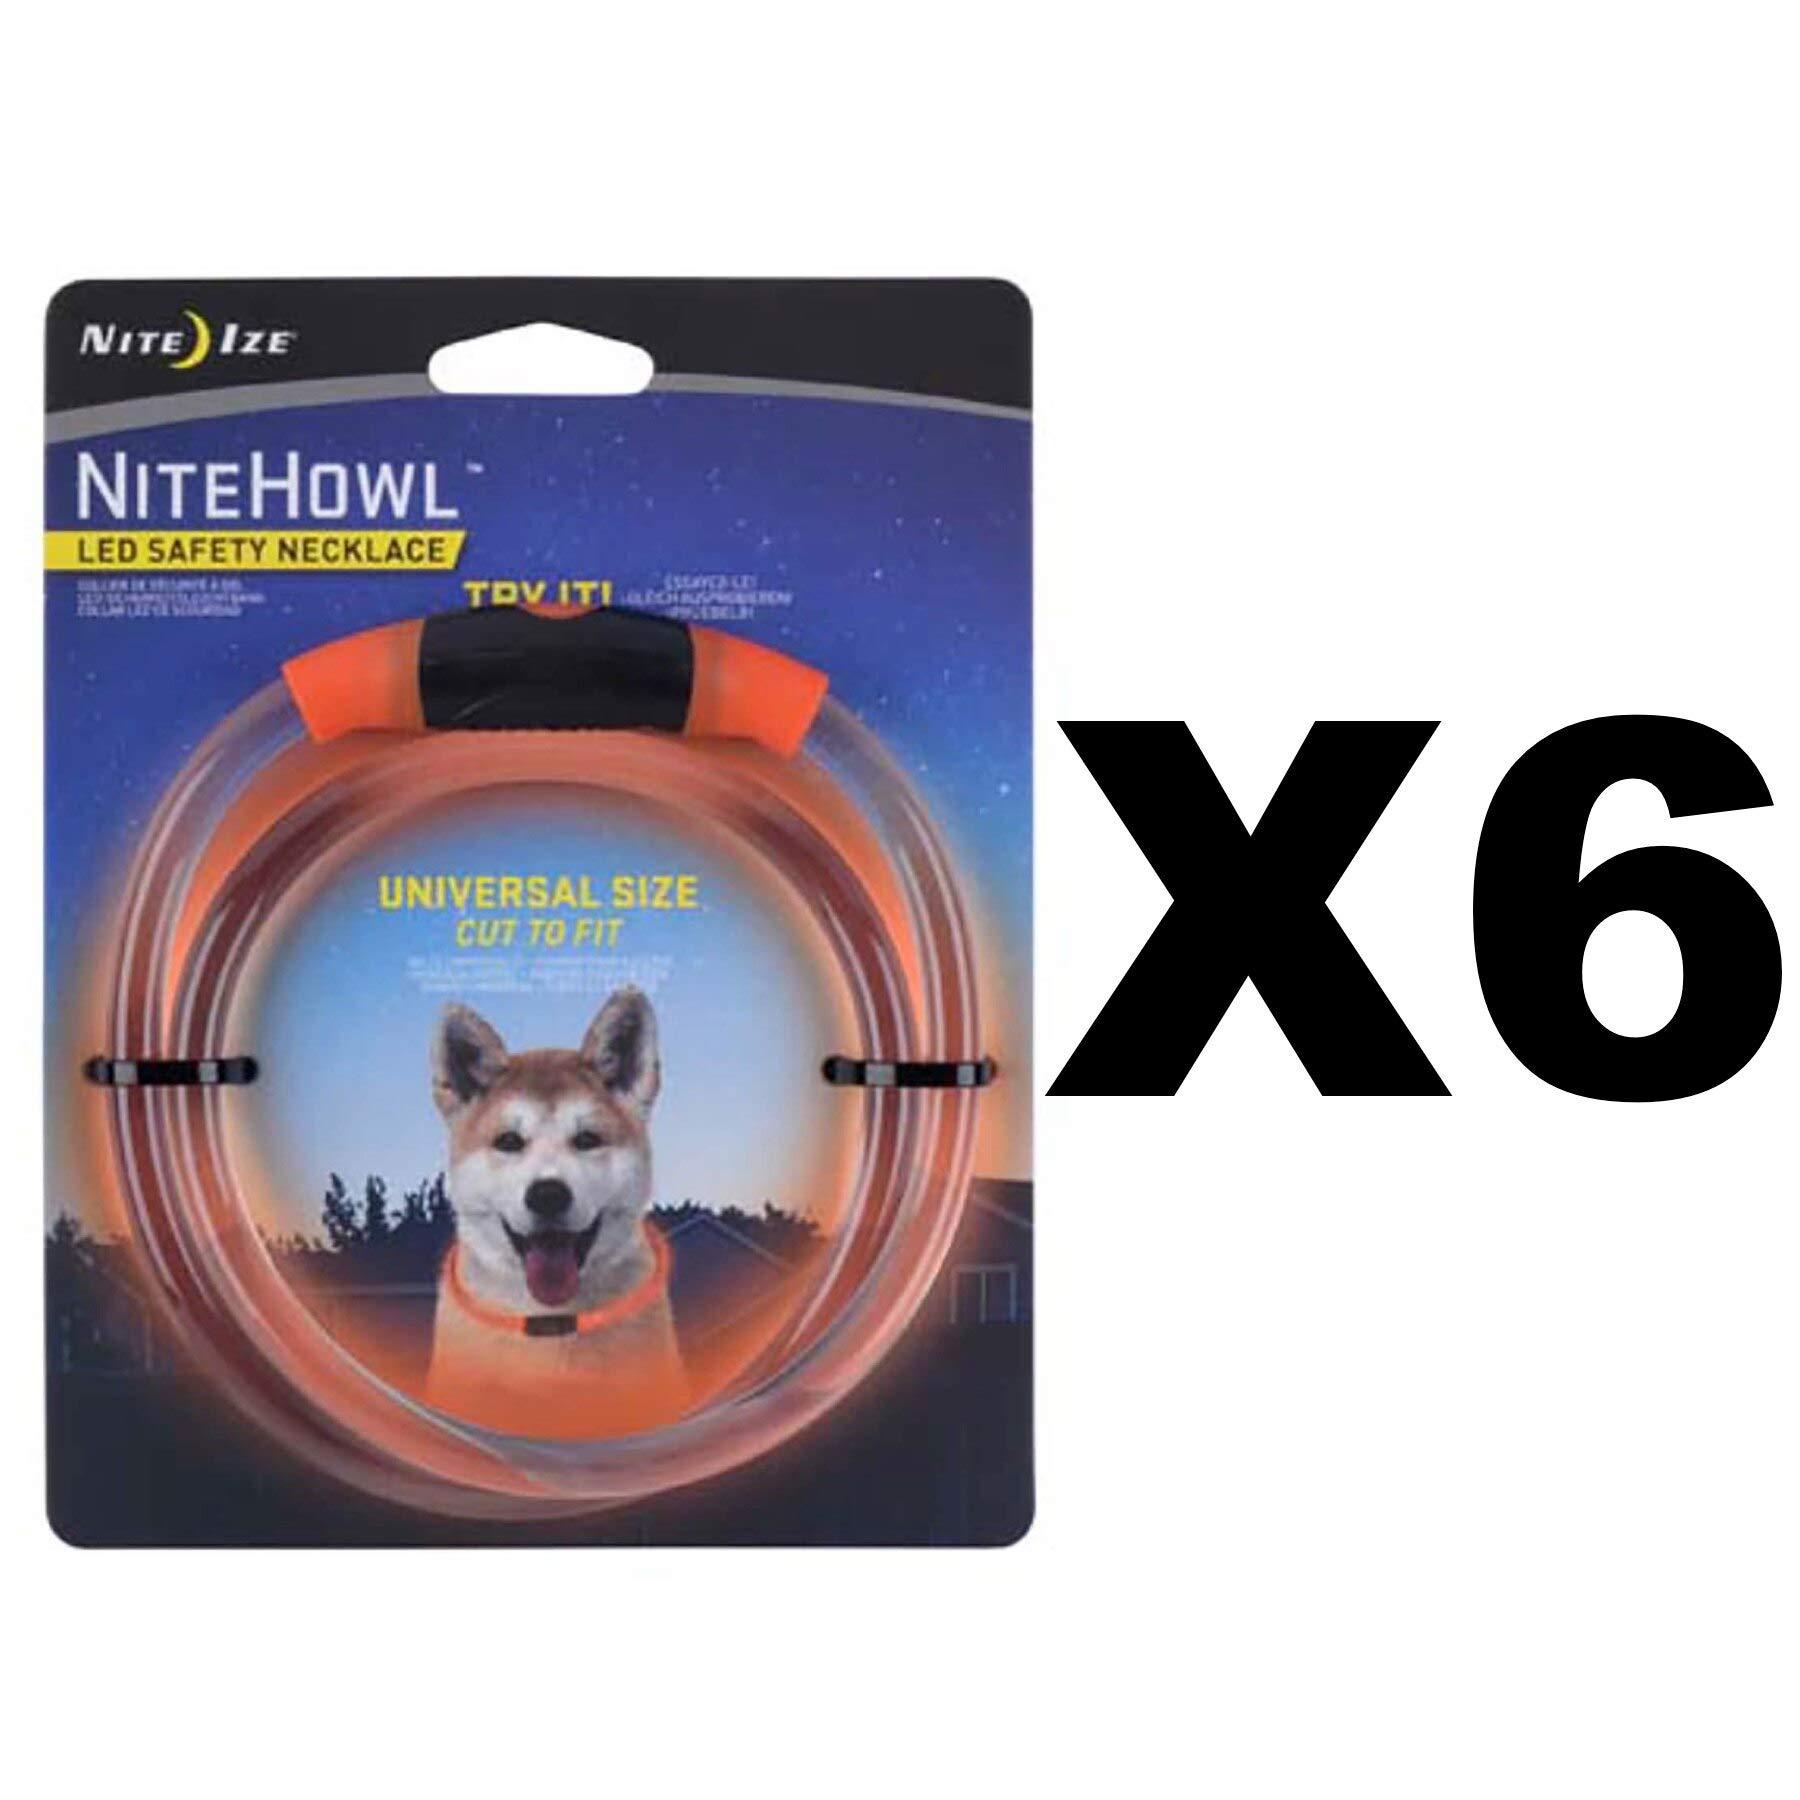 Nite Ize NHO-19-R3 NiteHowl LED Safety Dog Collar Necklace - Quantity 6